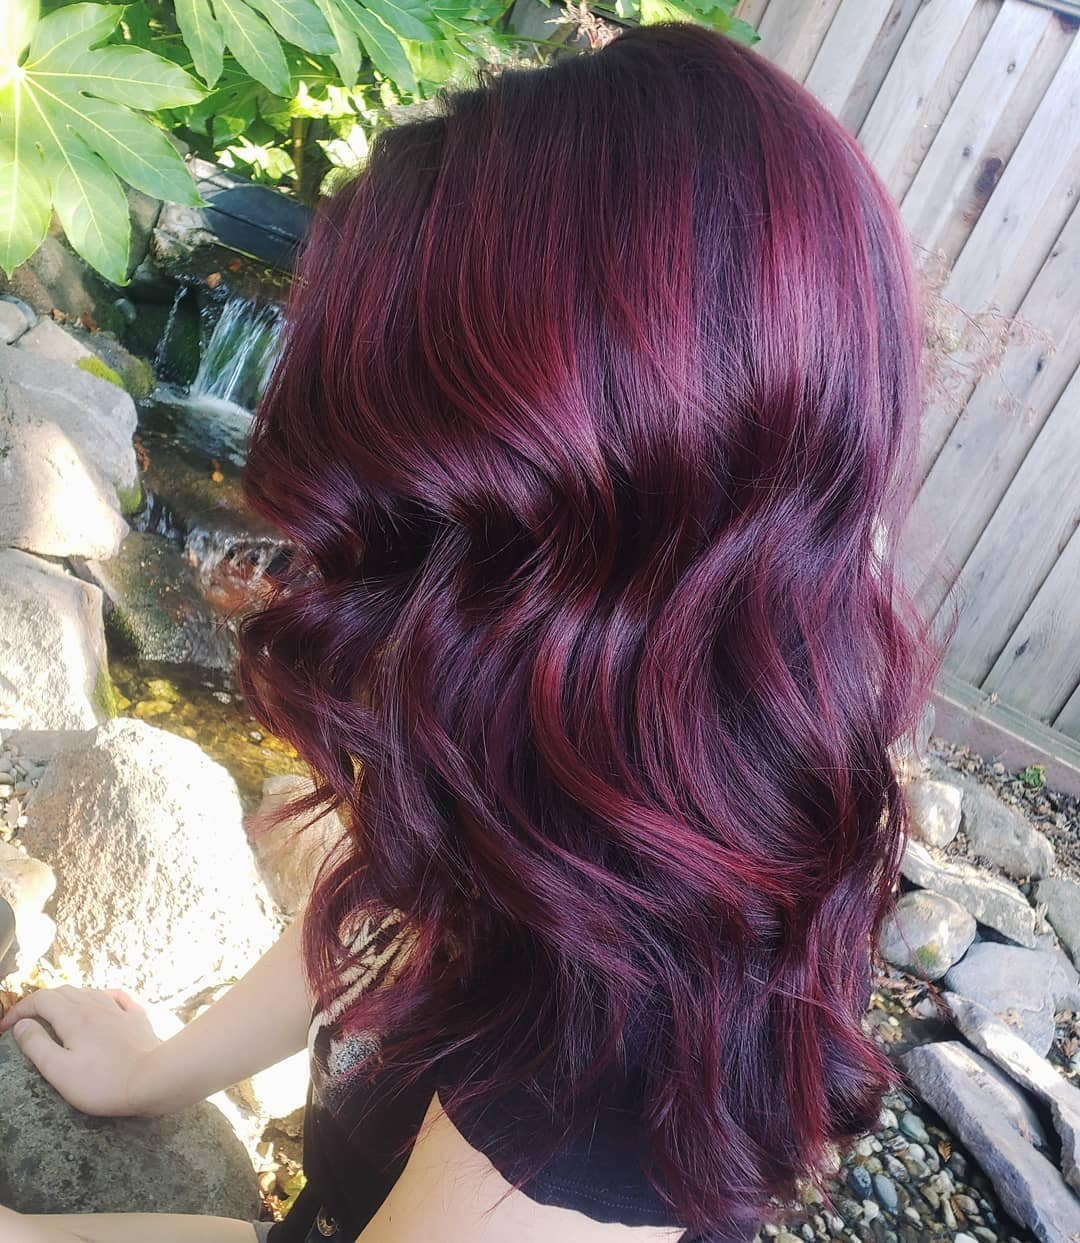 Woman with mid-length curly burgundy mahogany hair